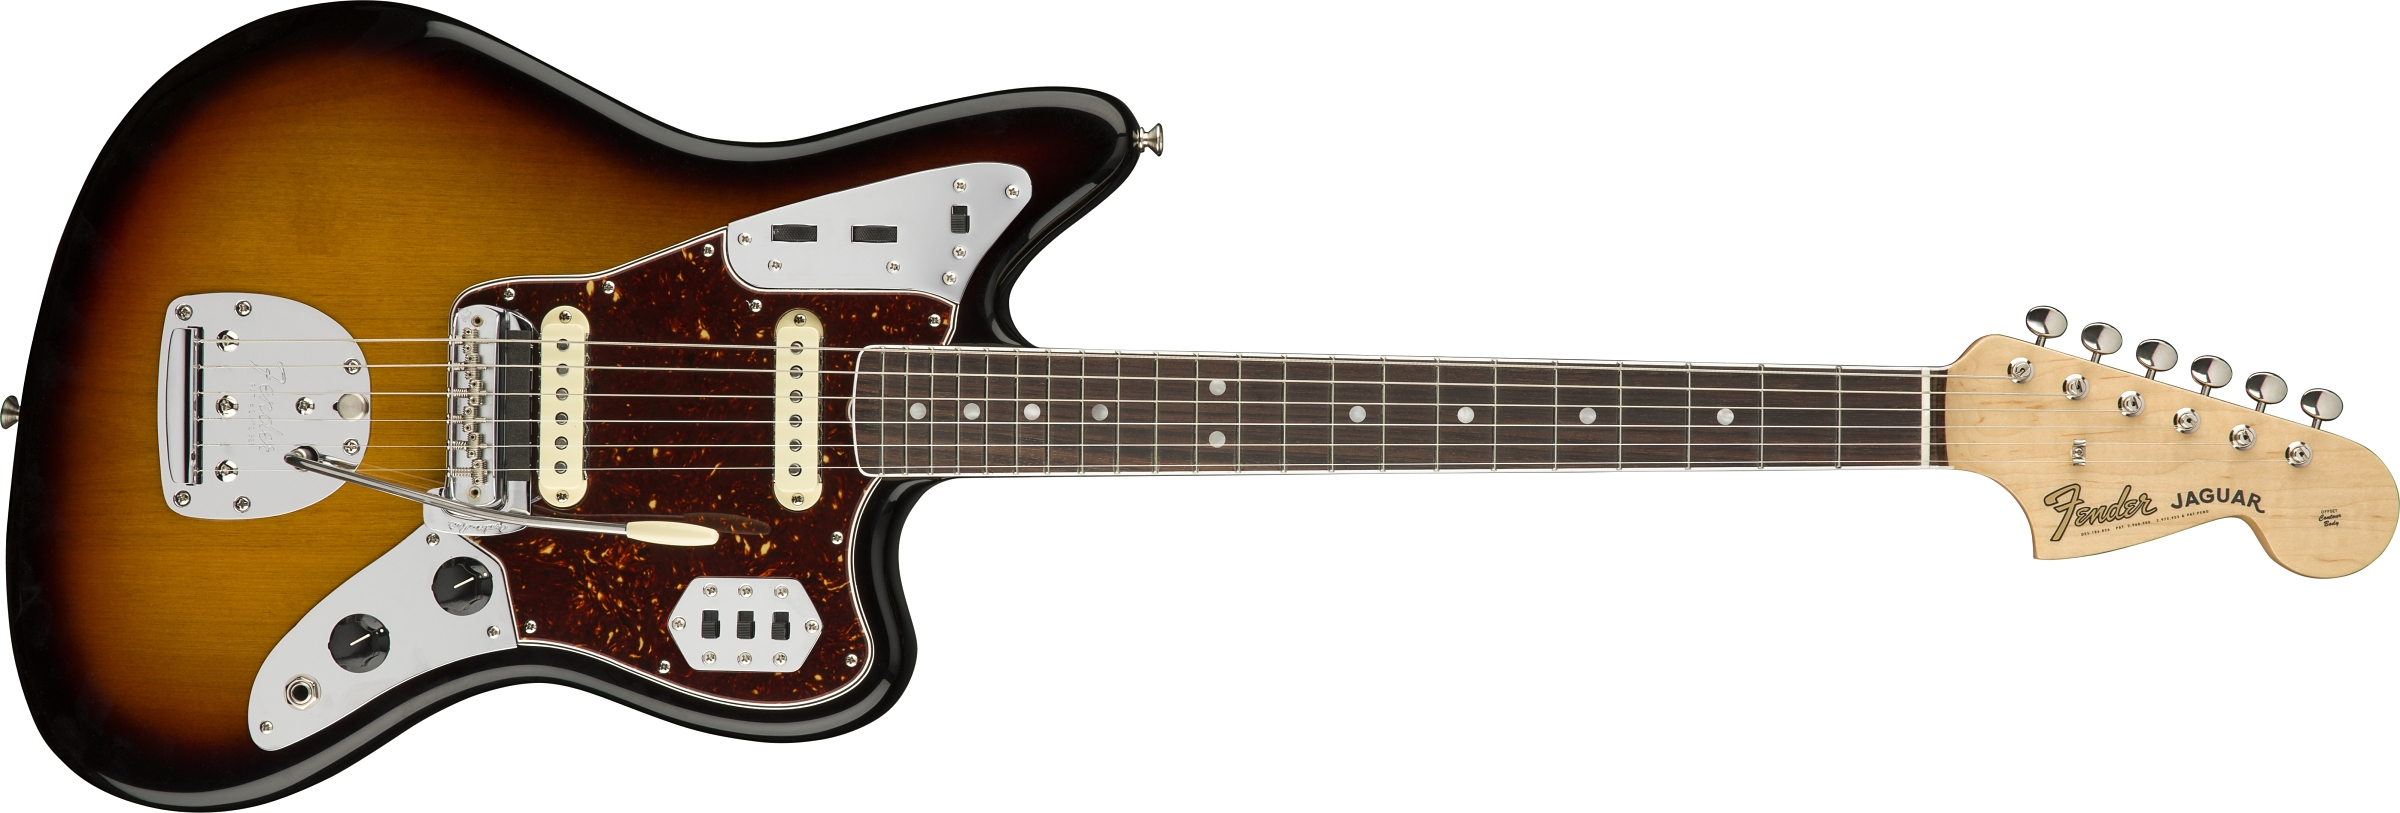 american original 39 60s jaguar electric guitars. Black Bedroom Furniture Sets. Home Design Ideas